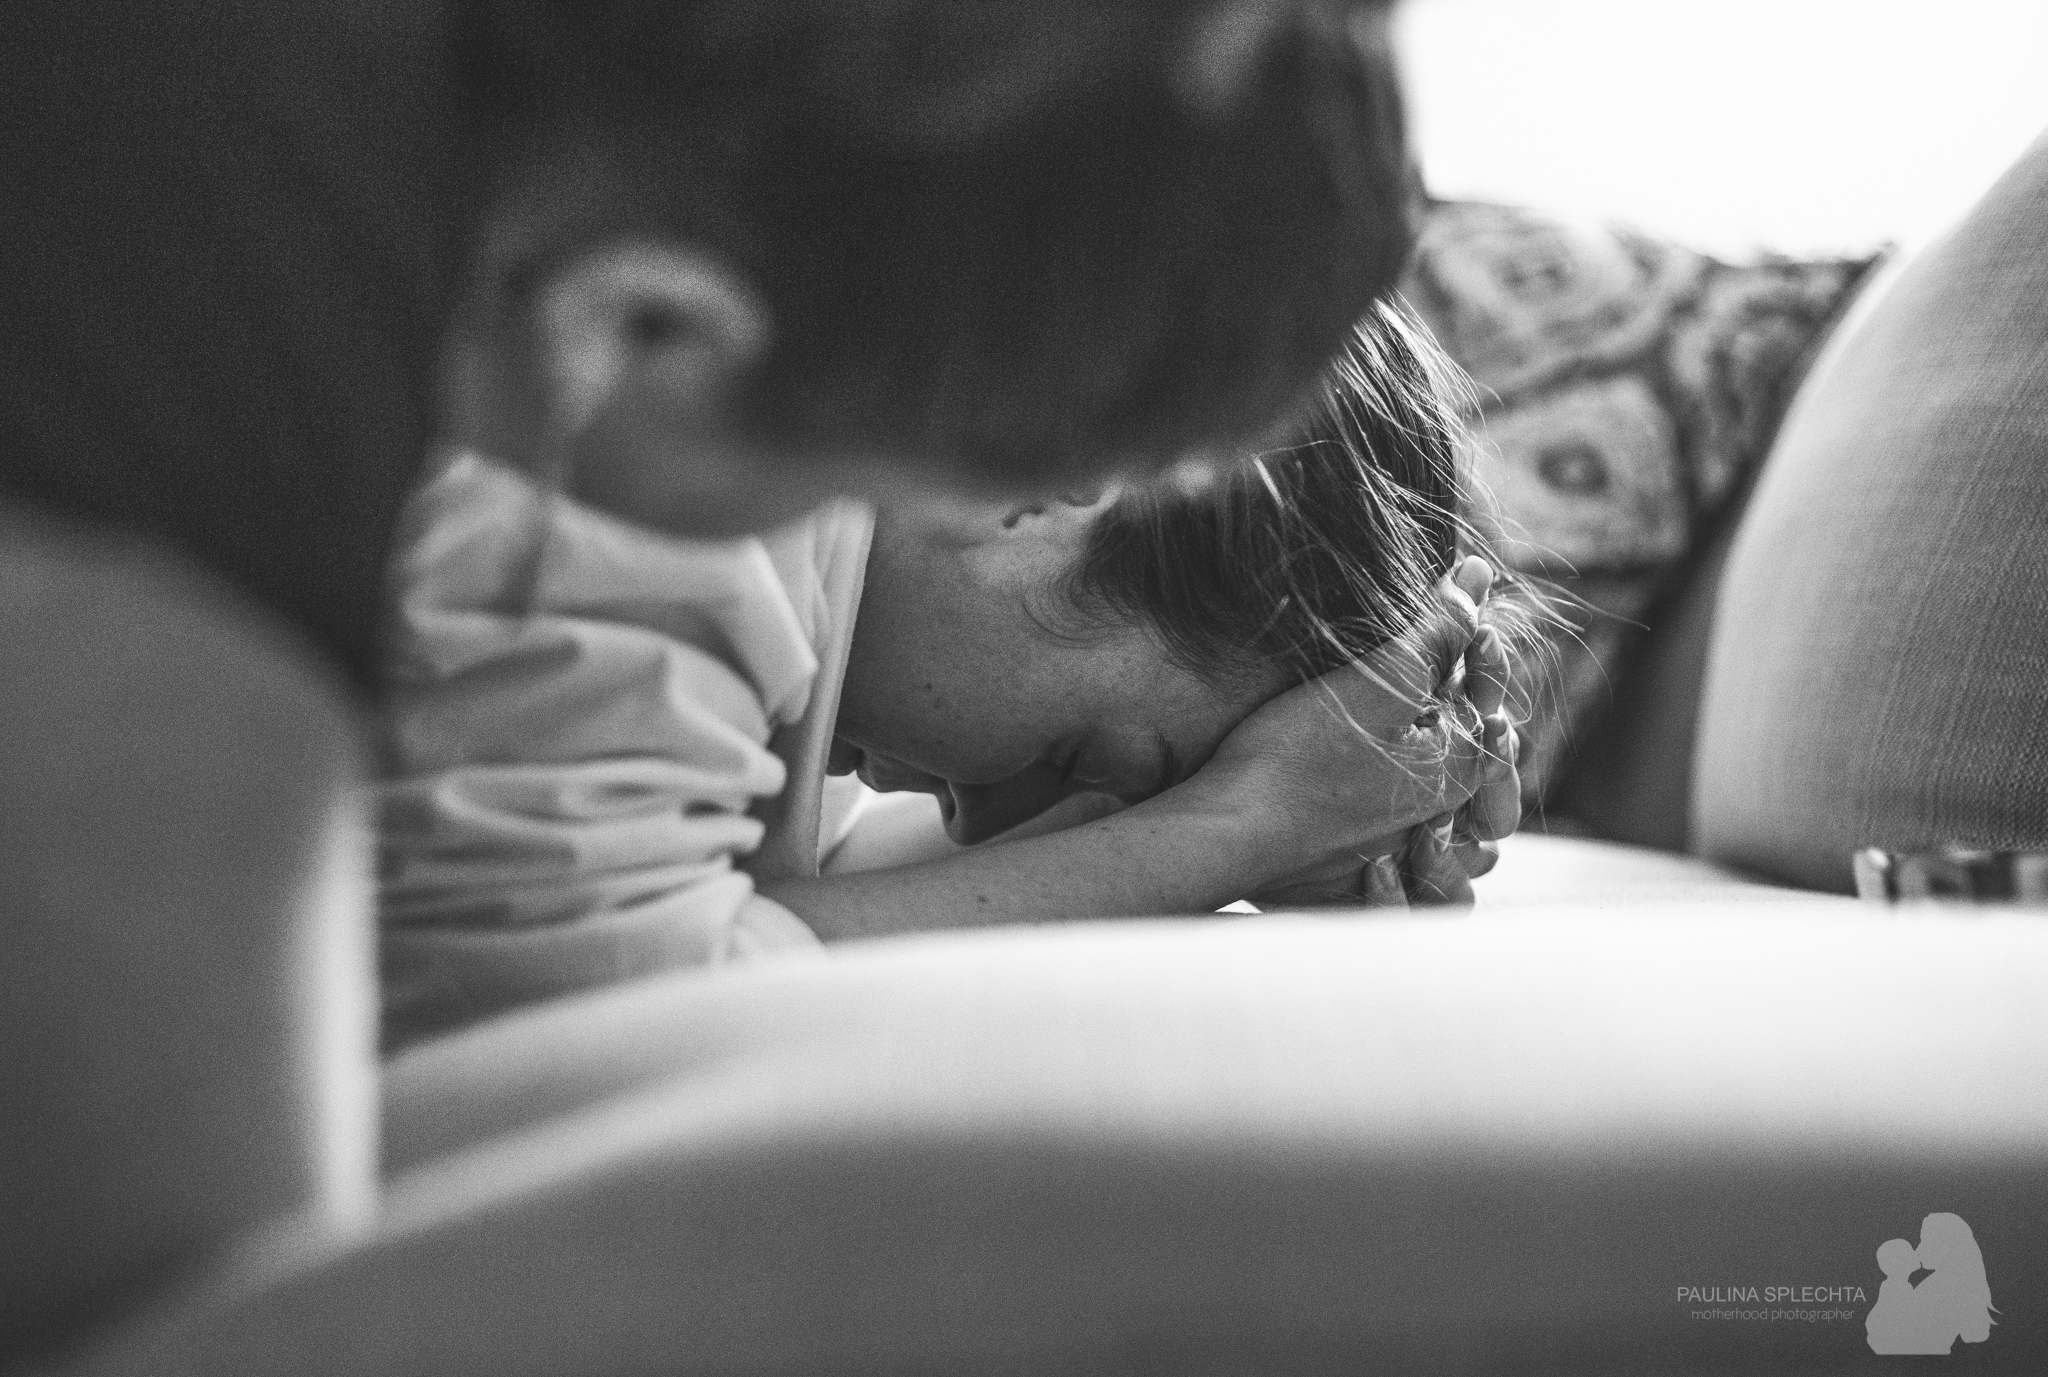 hypnobirthing-birth-center-natural-breastfeeding-delray-beach-boca-hollywood-south-florida-photographer-photography-family-maternity-pregnancy-pregnant-third-trimester-ultrasound-ob-obgyn-midwife-doula-hospital-home-water-tub-prenatal-class-newborn-2.jpg